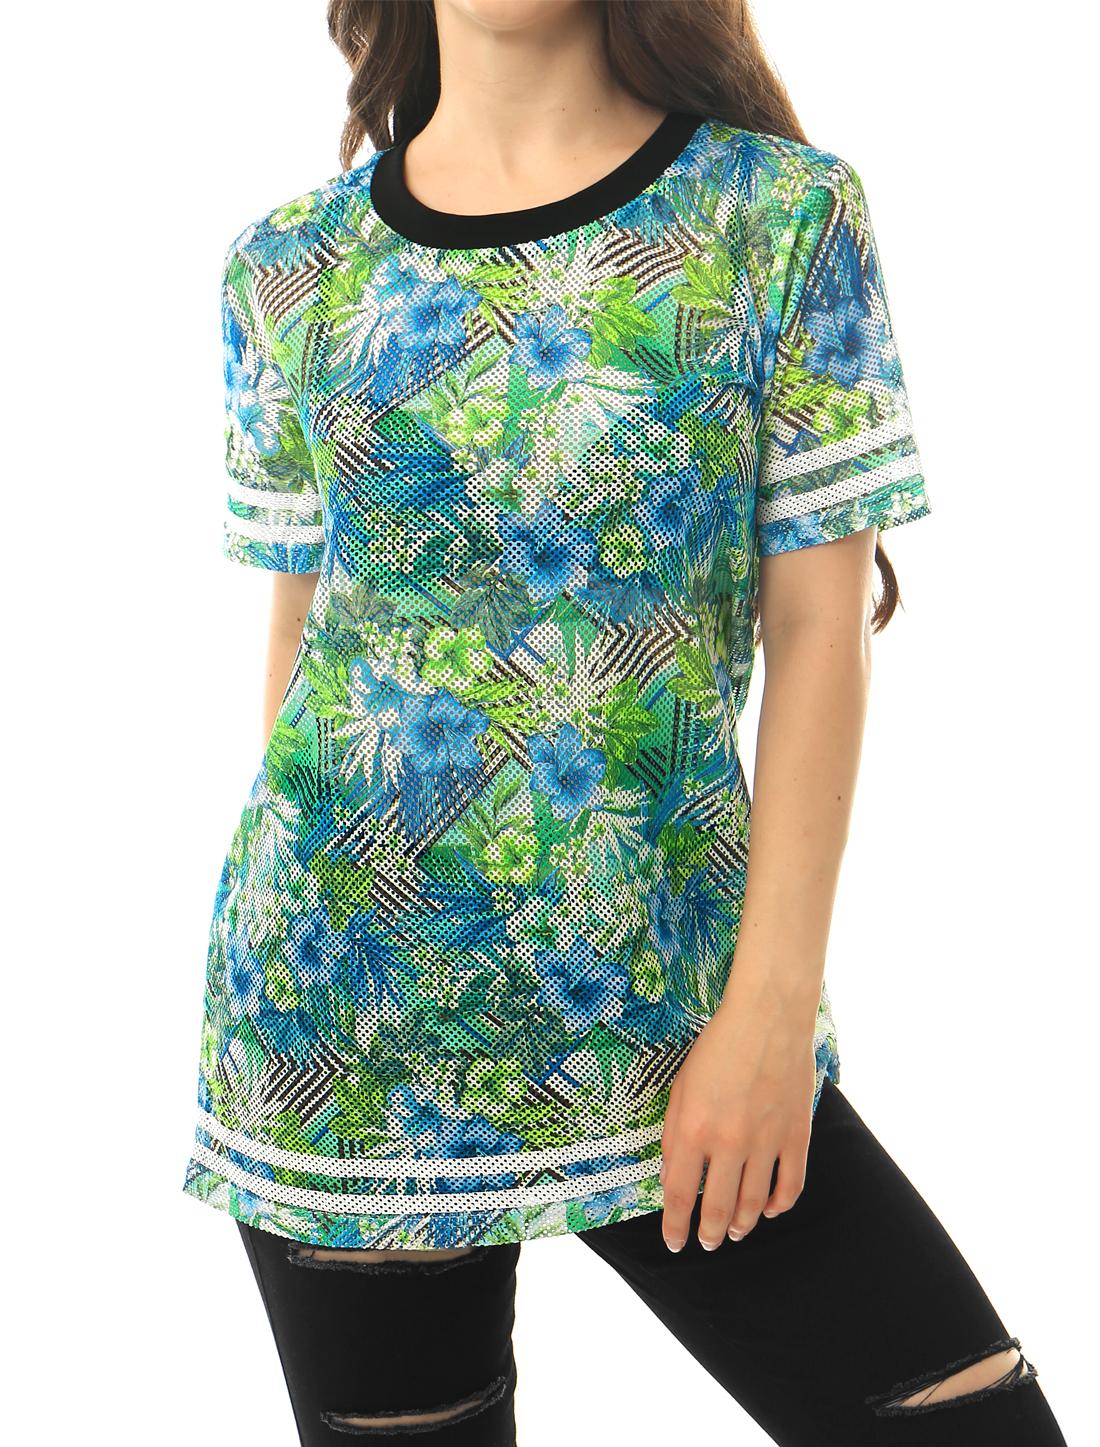 Women Floral Print Semi Sheer Casual Longline Mesh Top Blue Green XS